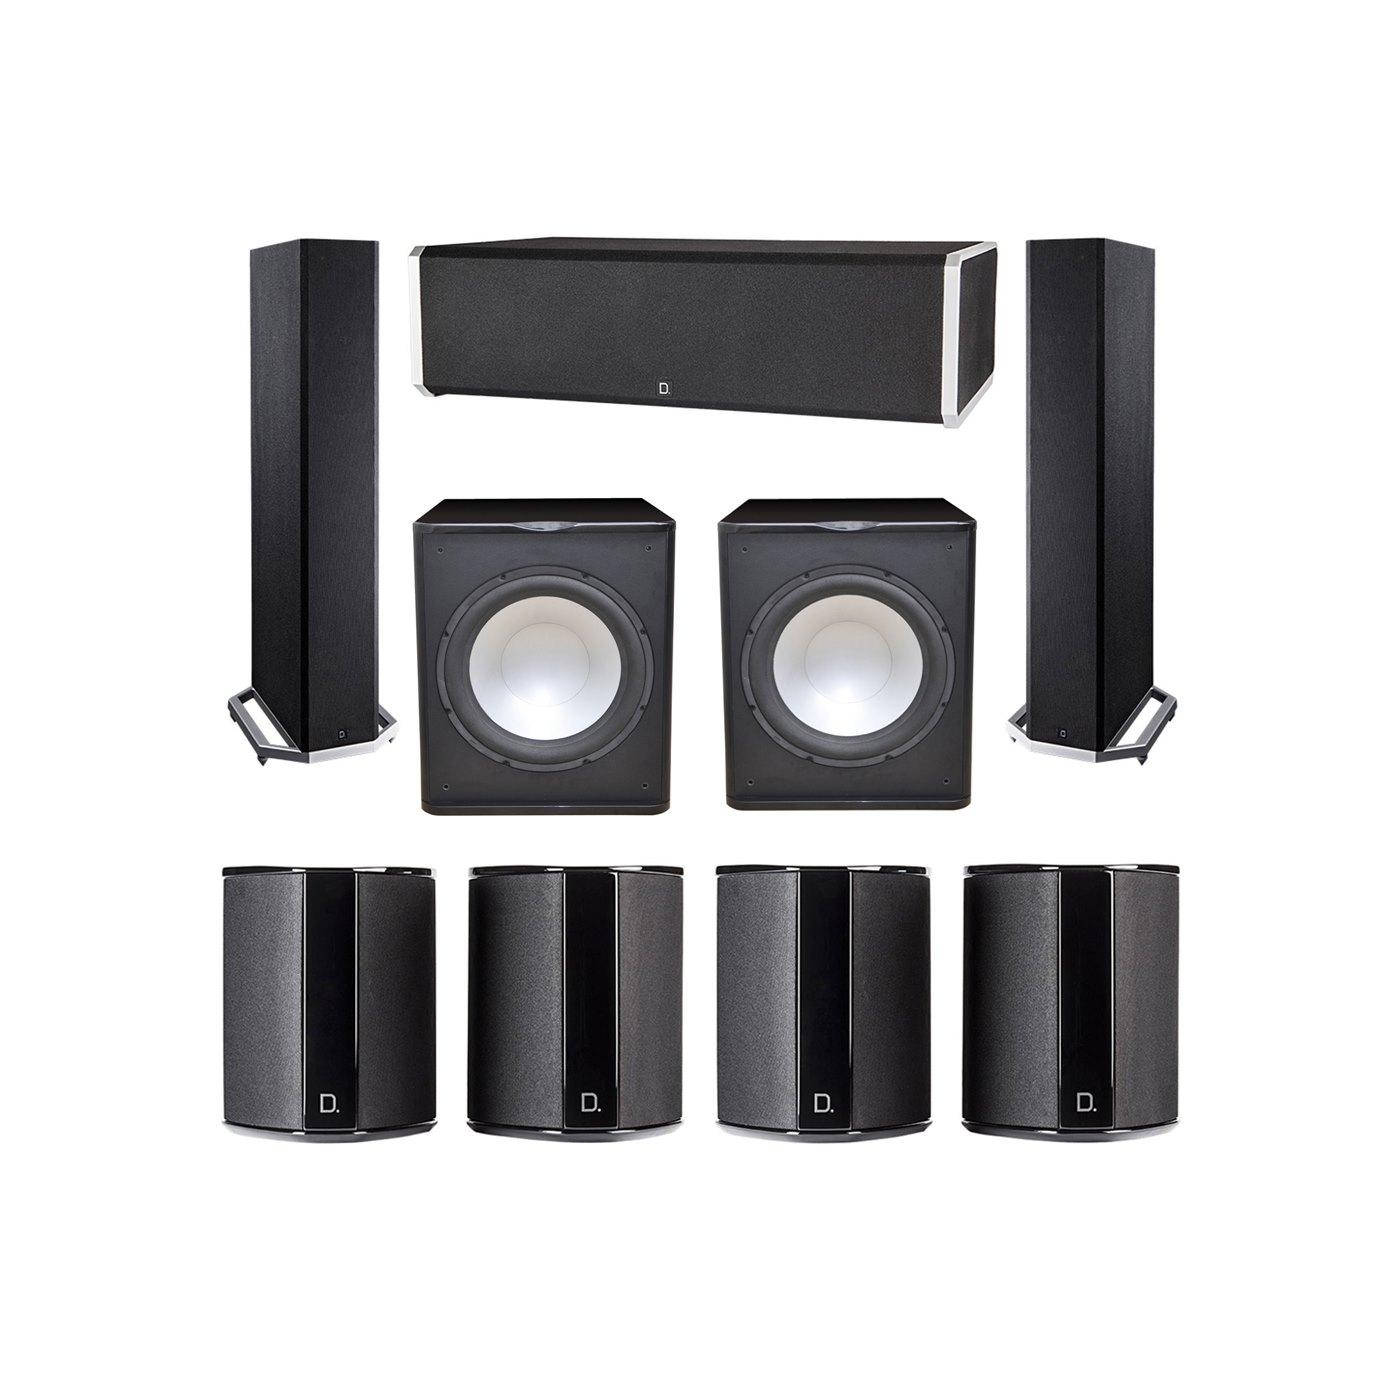 Definitive Technology 7.2 System with 2 BP9020 Tower Speakers, 1 CS9060 Center Channel Speaker, 4 SR9040 Surround Speaker, 2 Premier Acoustic PA-150 Subwoofer